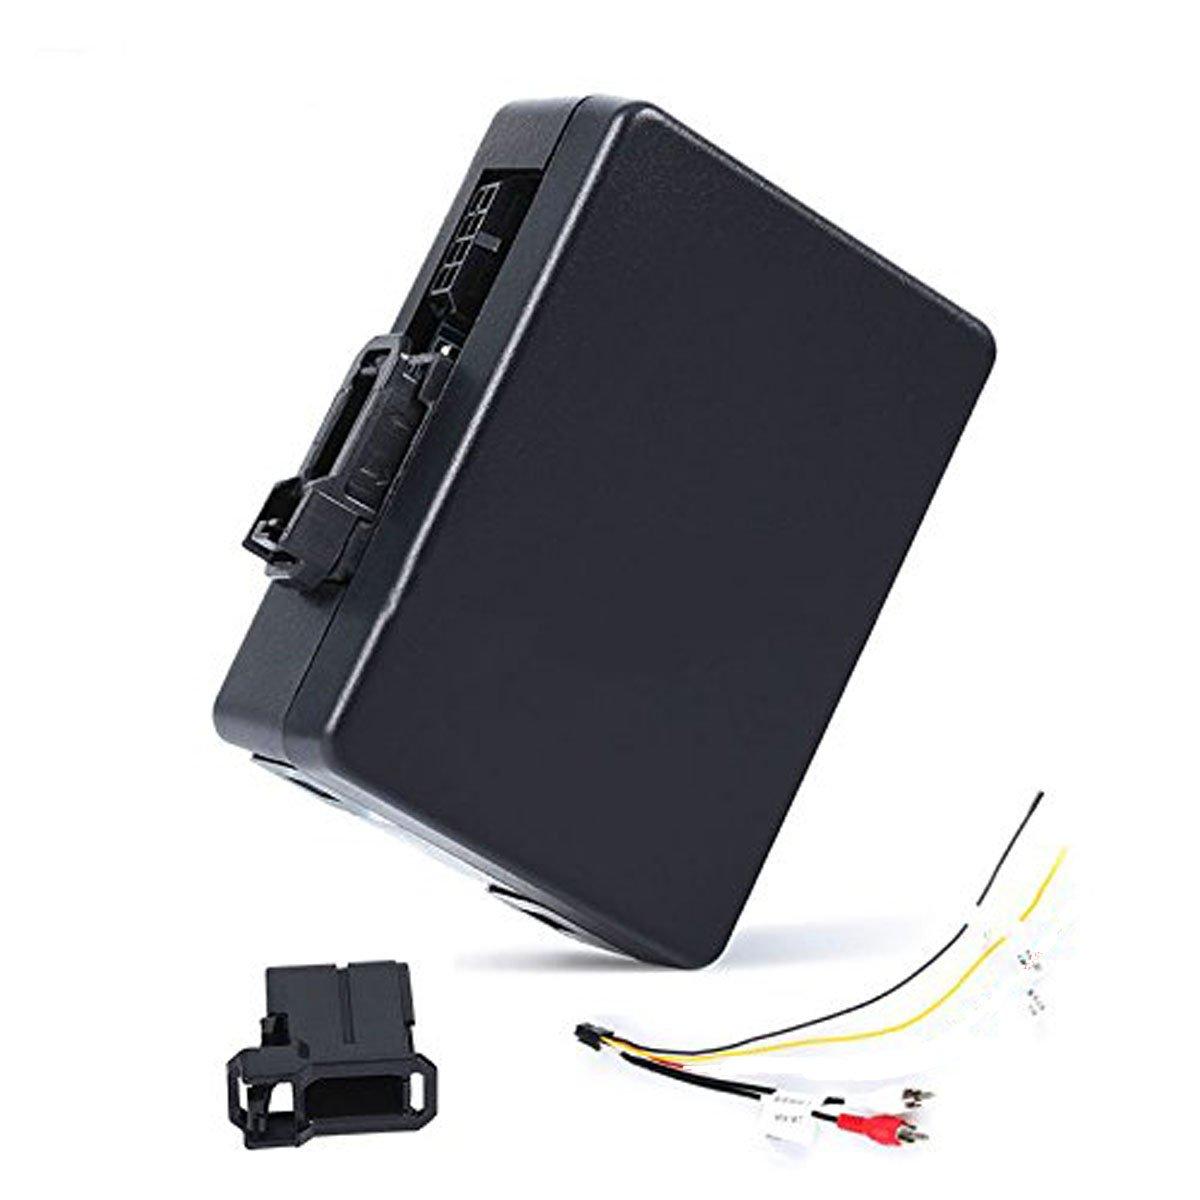 Car Stereo Radio Optical Fiber Decoder Most Box for Mercedes Benz CL/CLS/E/S/SL/SLK W211 W219 by Fly Flag